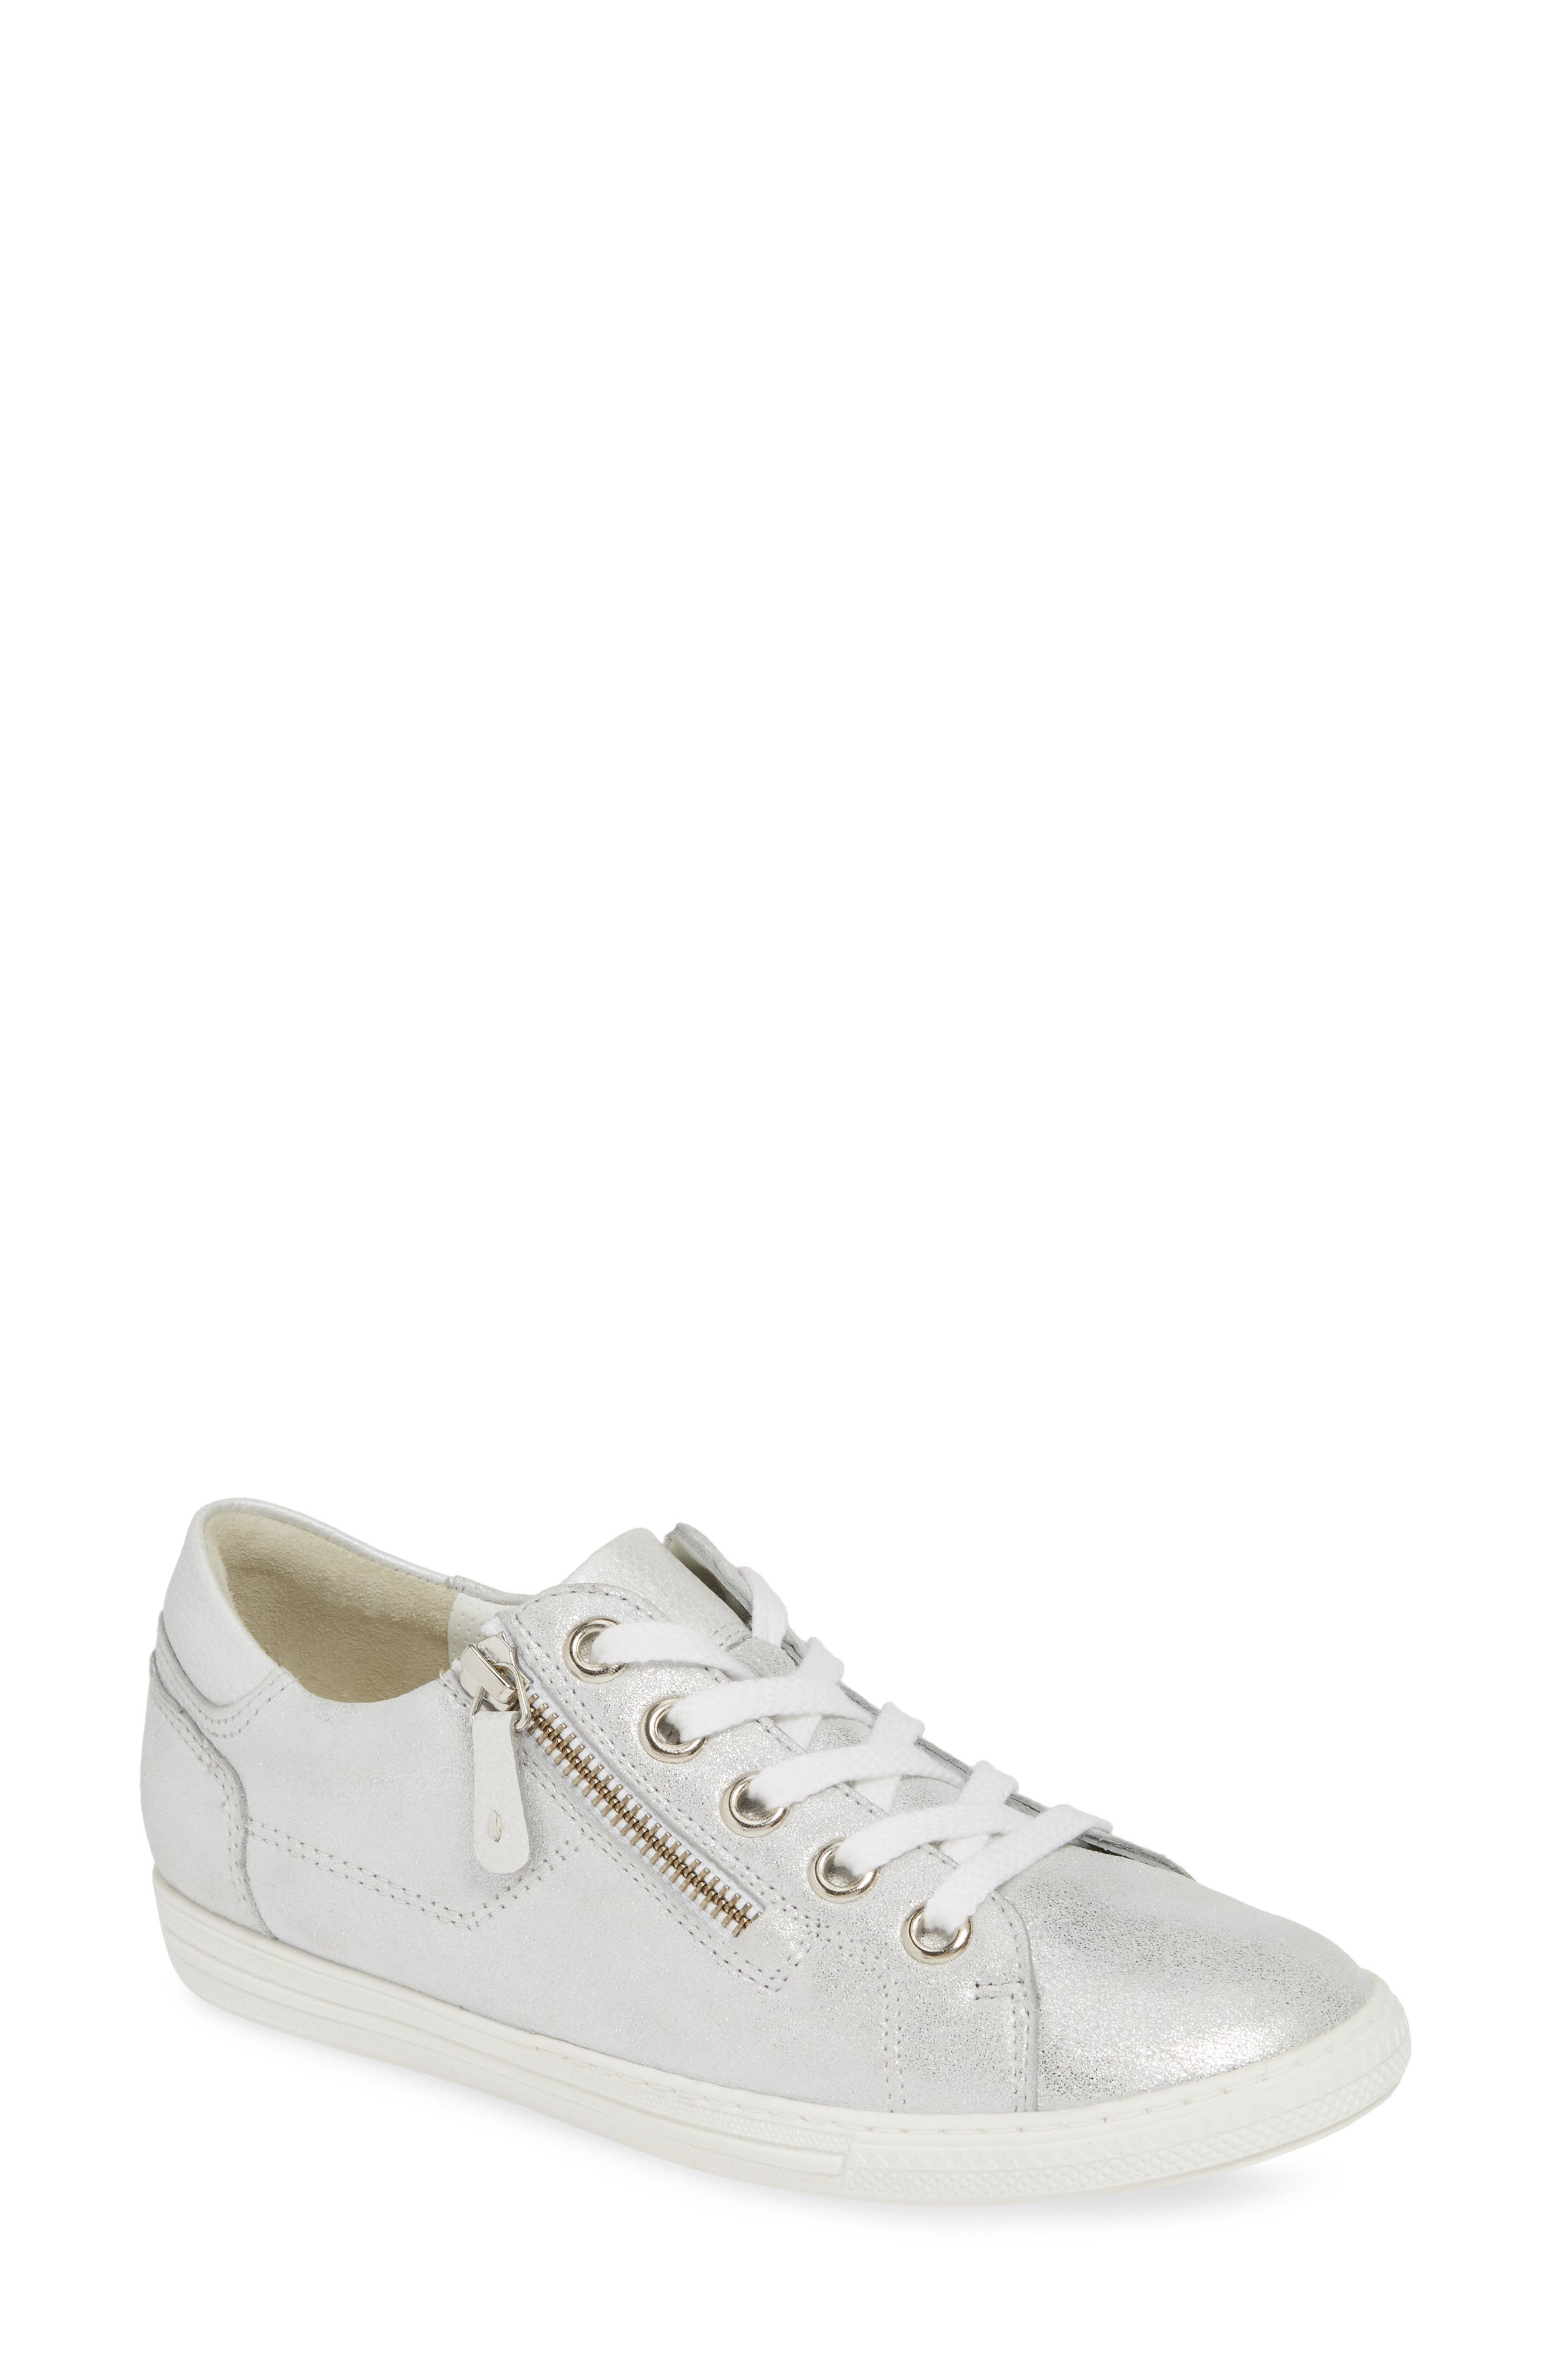 Women's Paul Green Sneakers & Athletic: Sale | Nordstrom